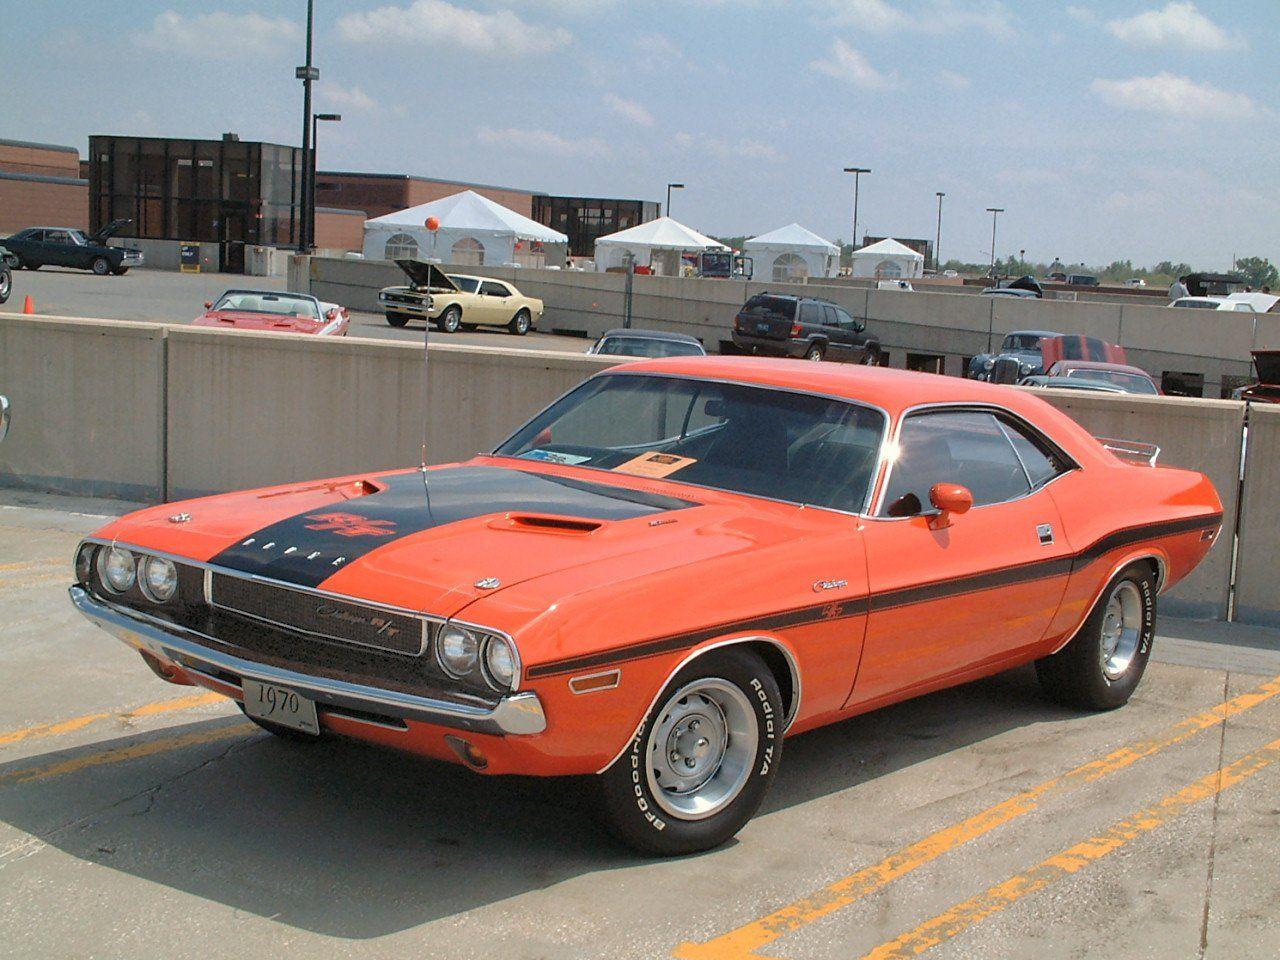 1970 dodge challenger rt 383 magnum hemi orange